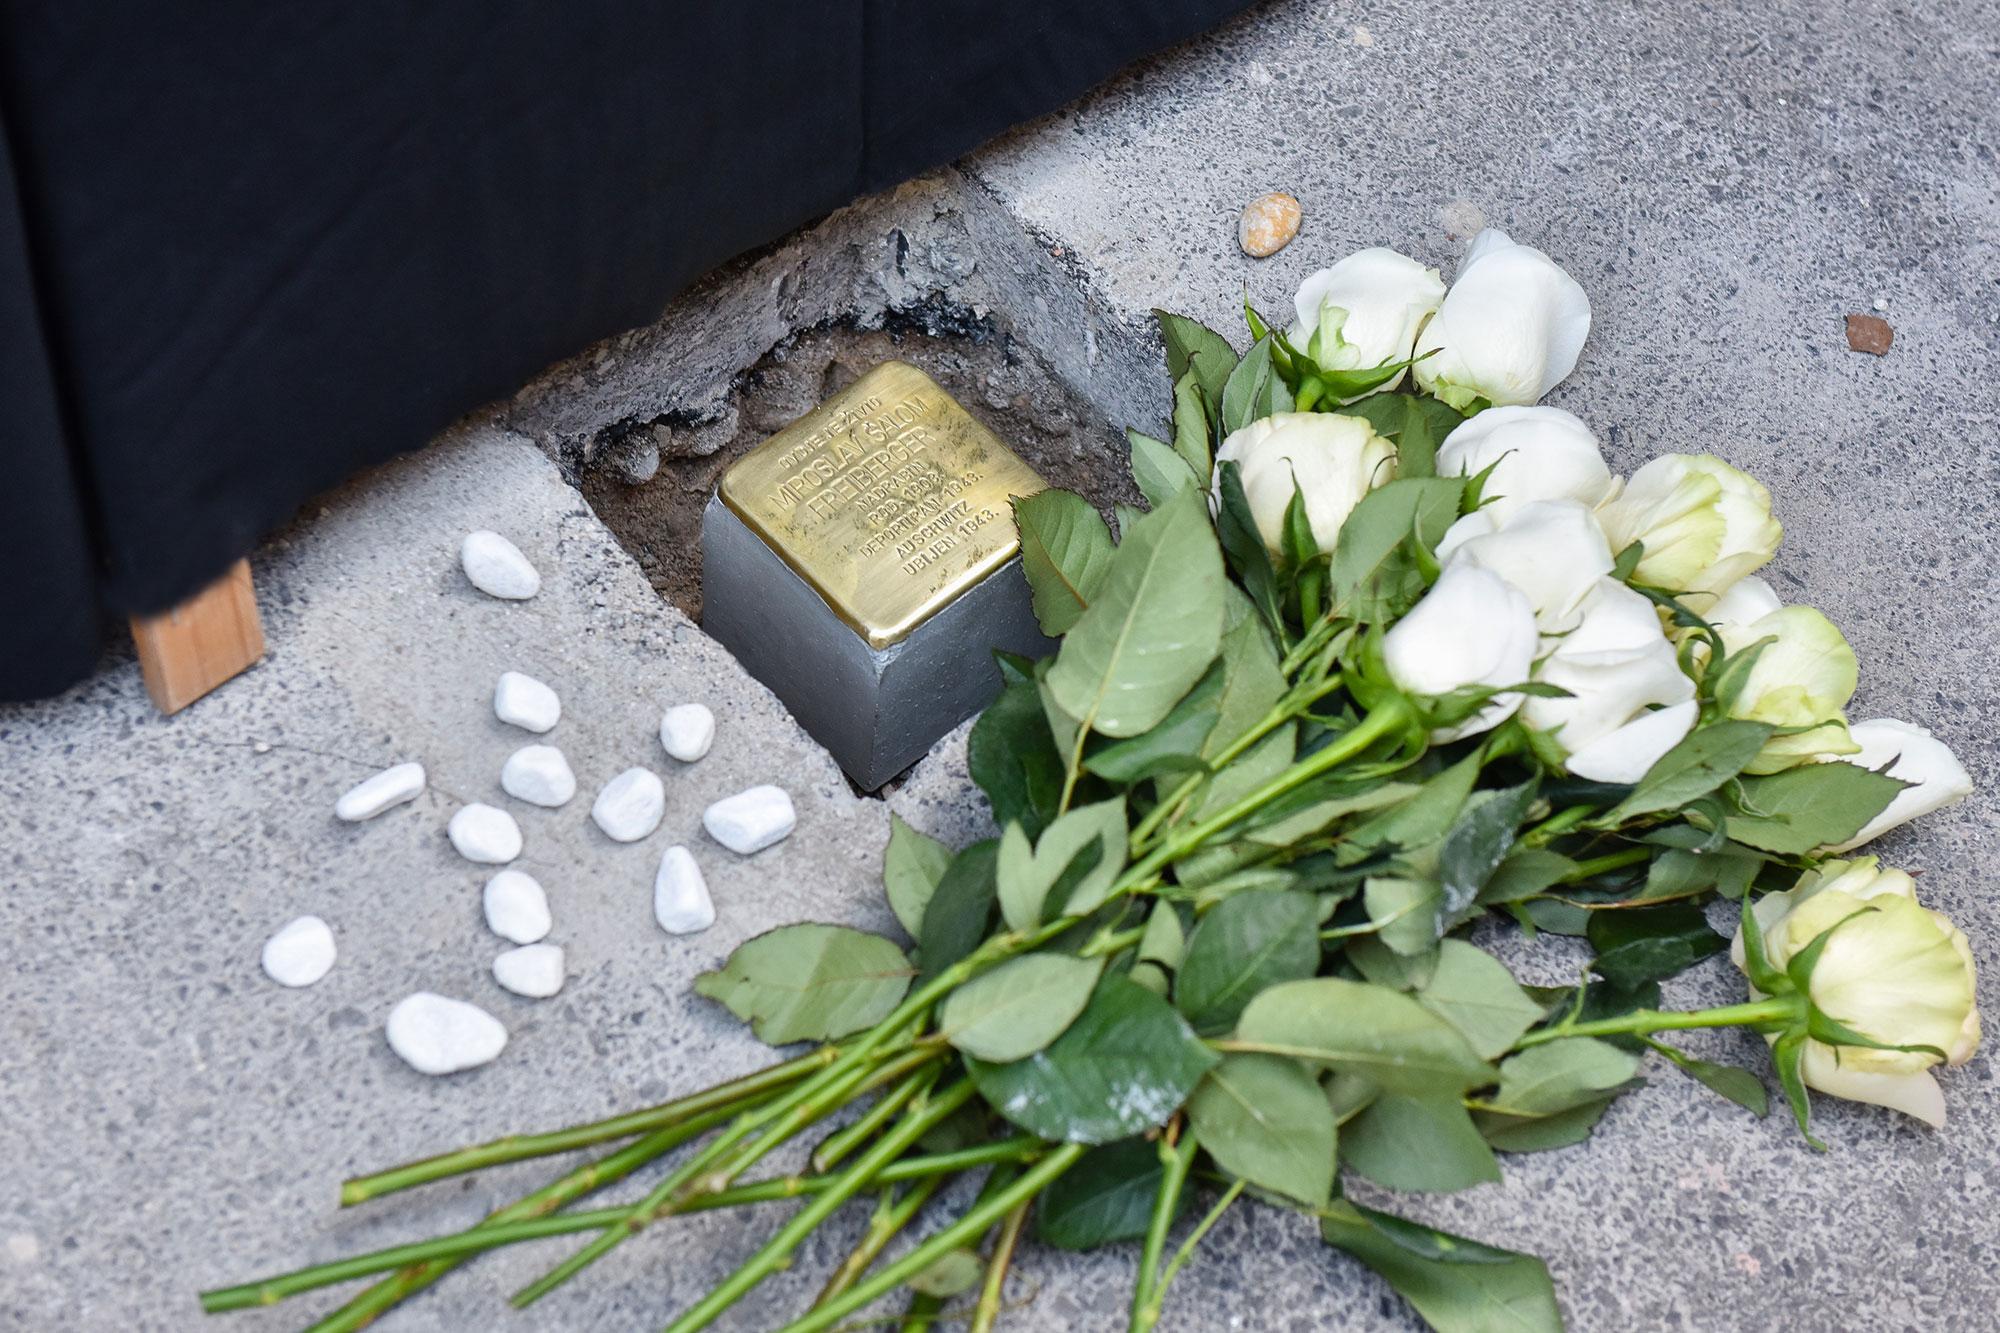 Ponovno postavljen kamen spoticanja za nadrabina Miroslava Šaloma Freibergera